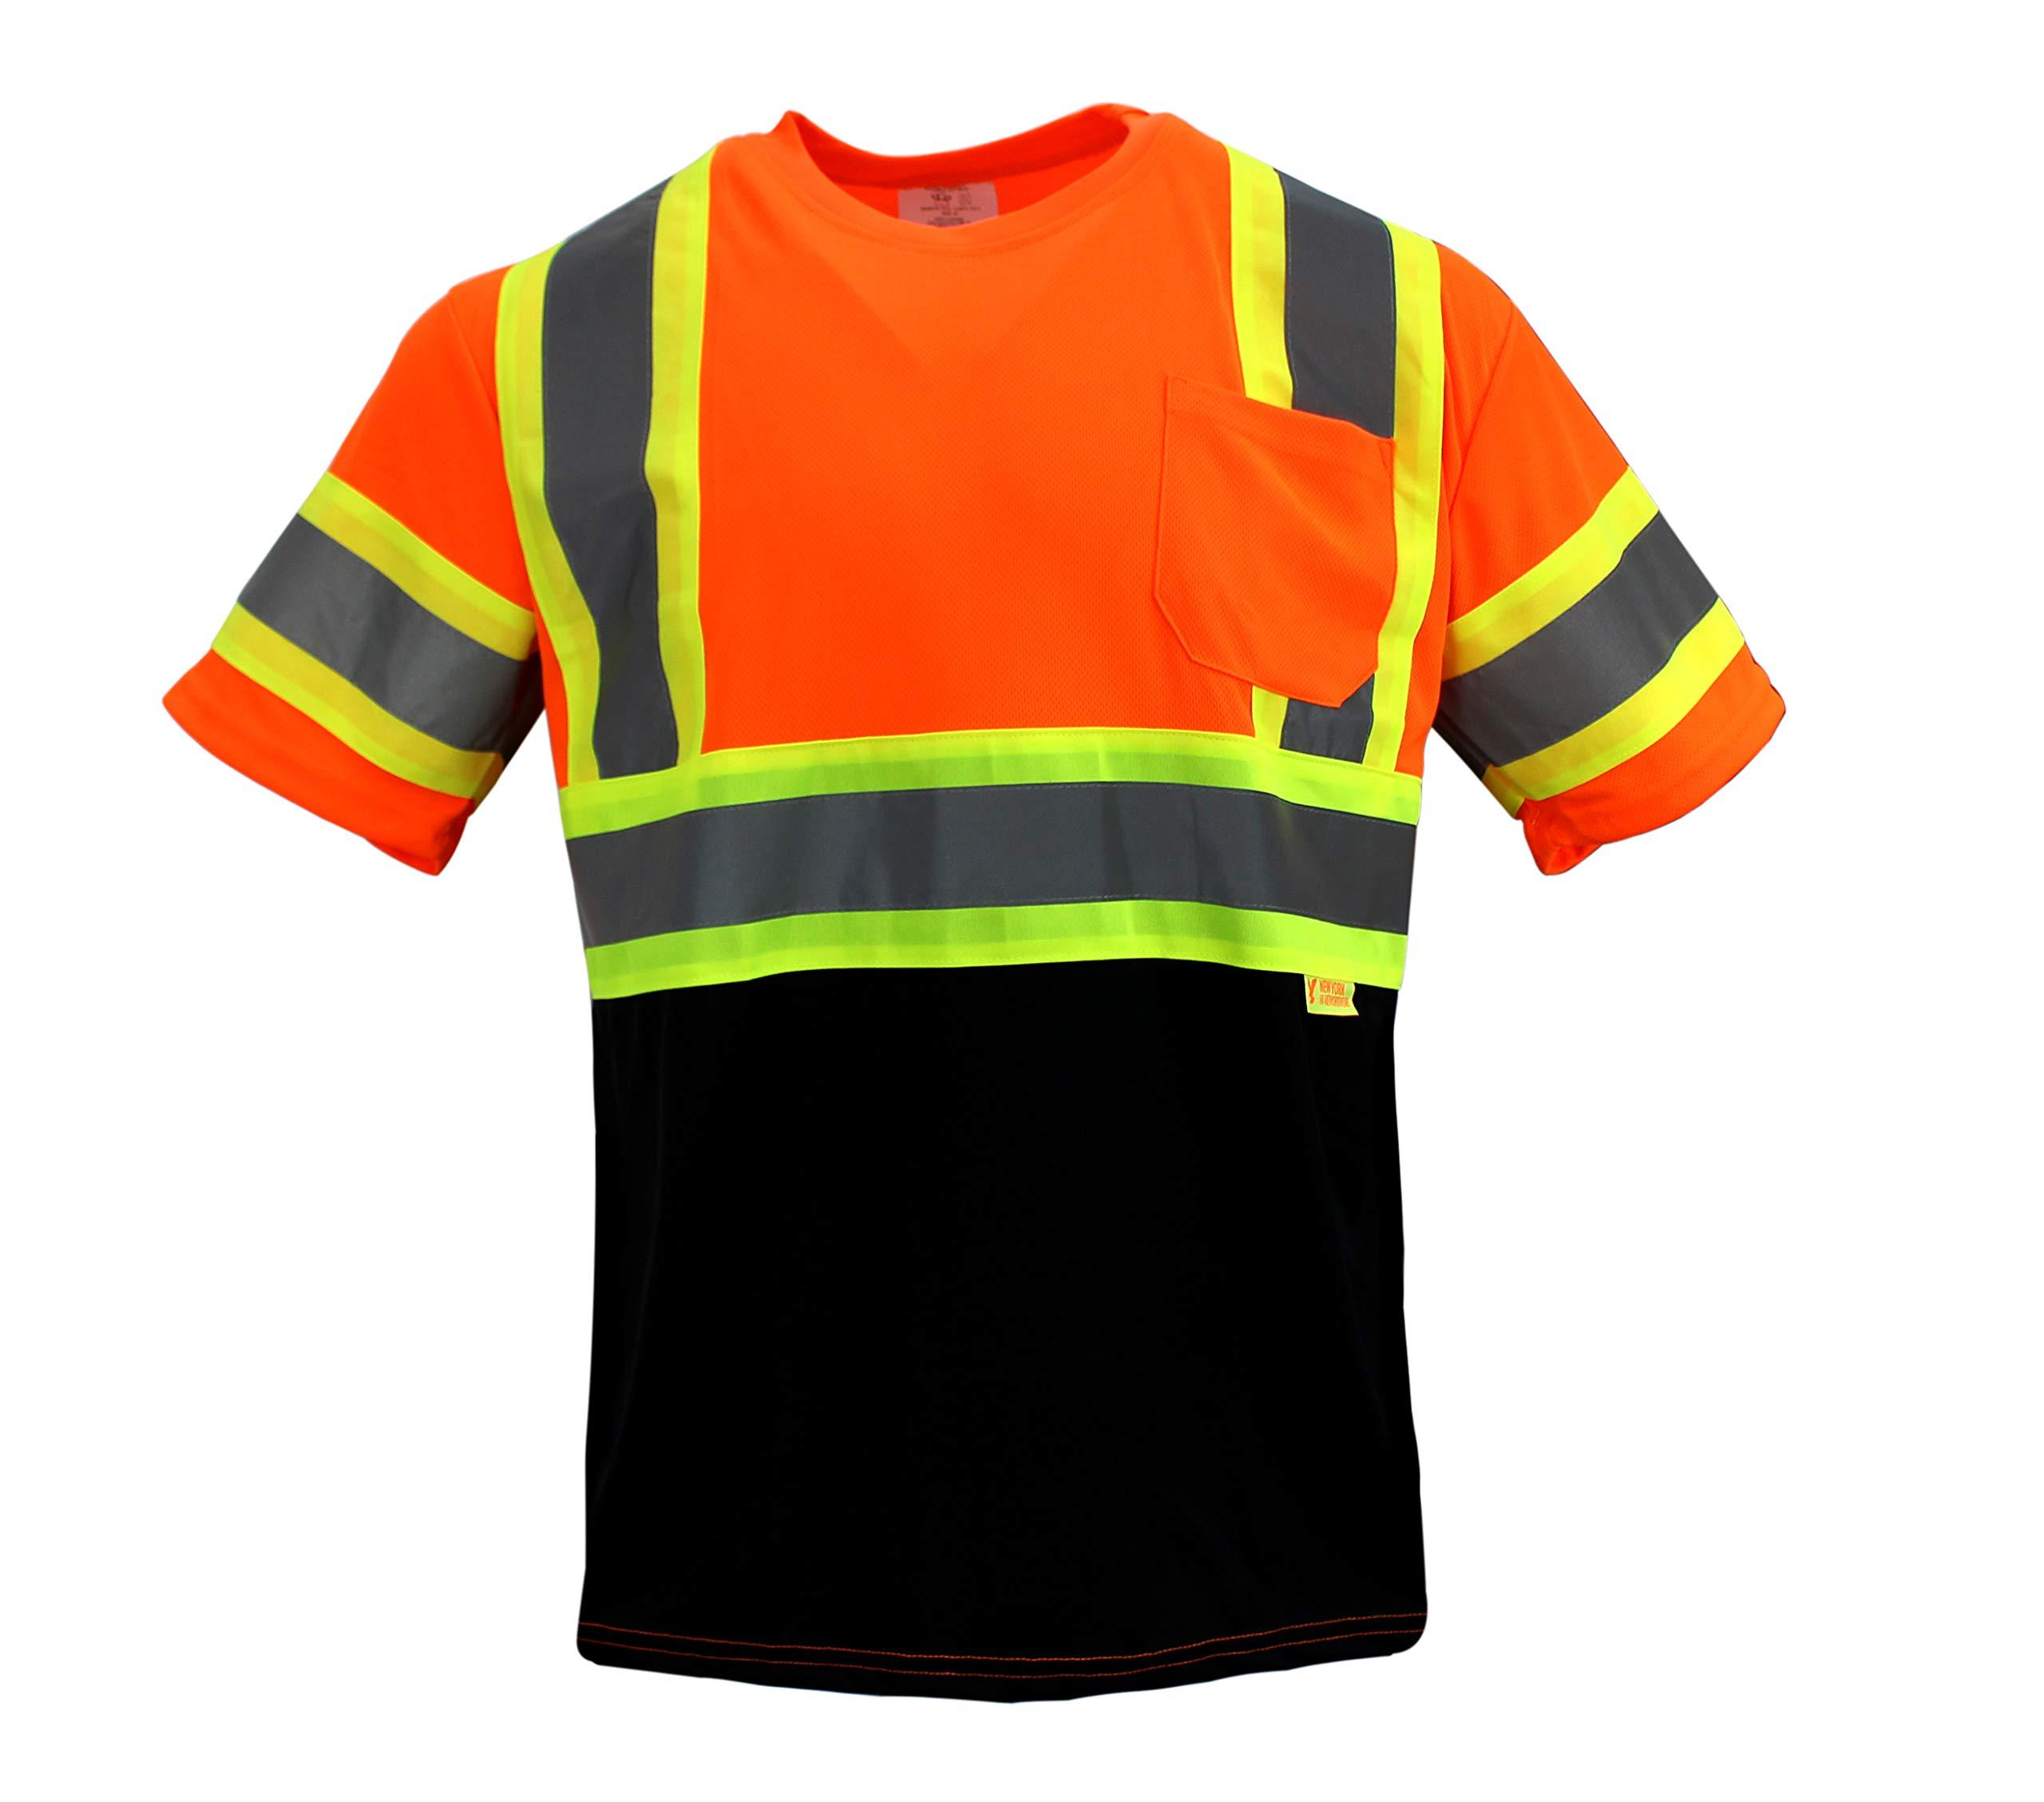 NY BFS-T5511 High-Visibility Class 3 T Shirt with Moisture Wicking Mesh Birdseye, Black Bottom (Orange)